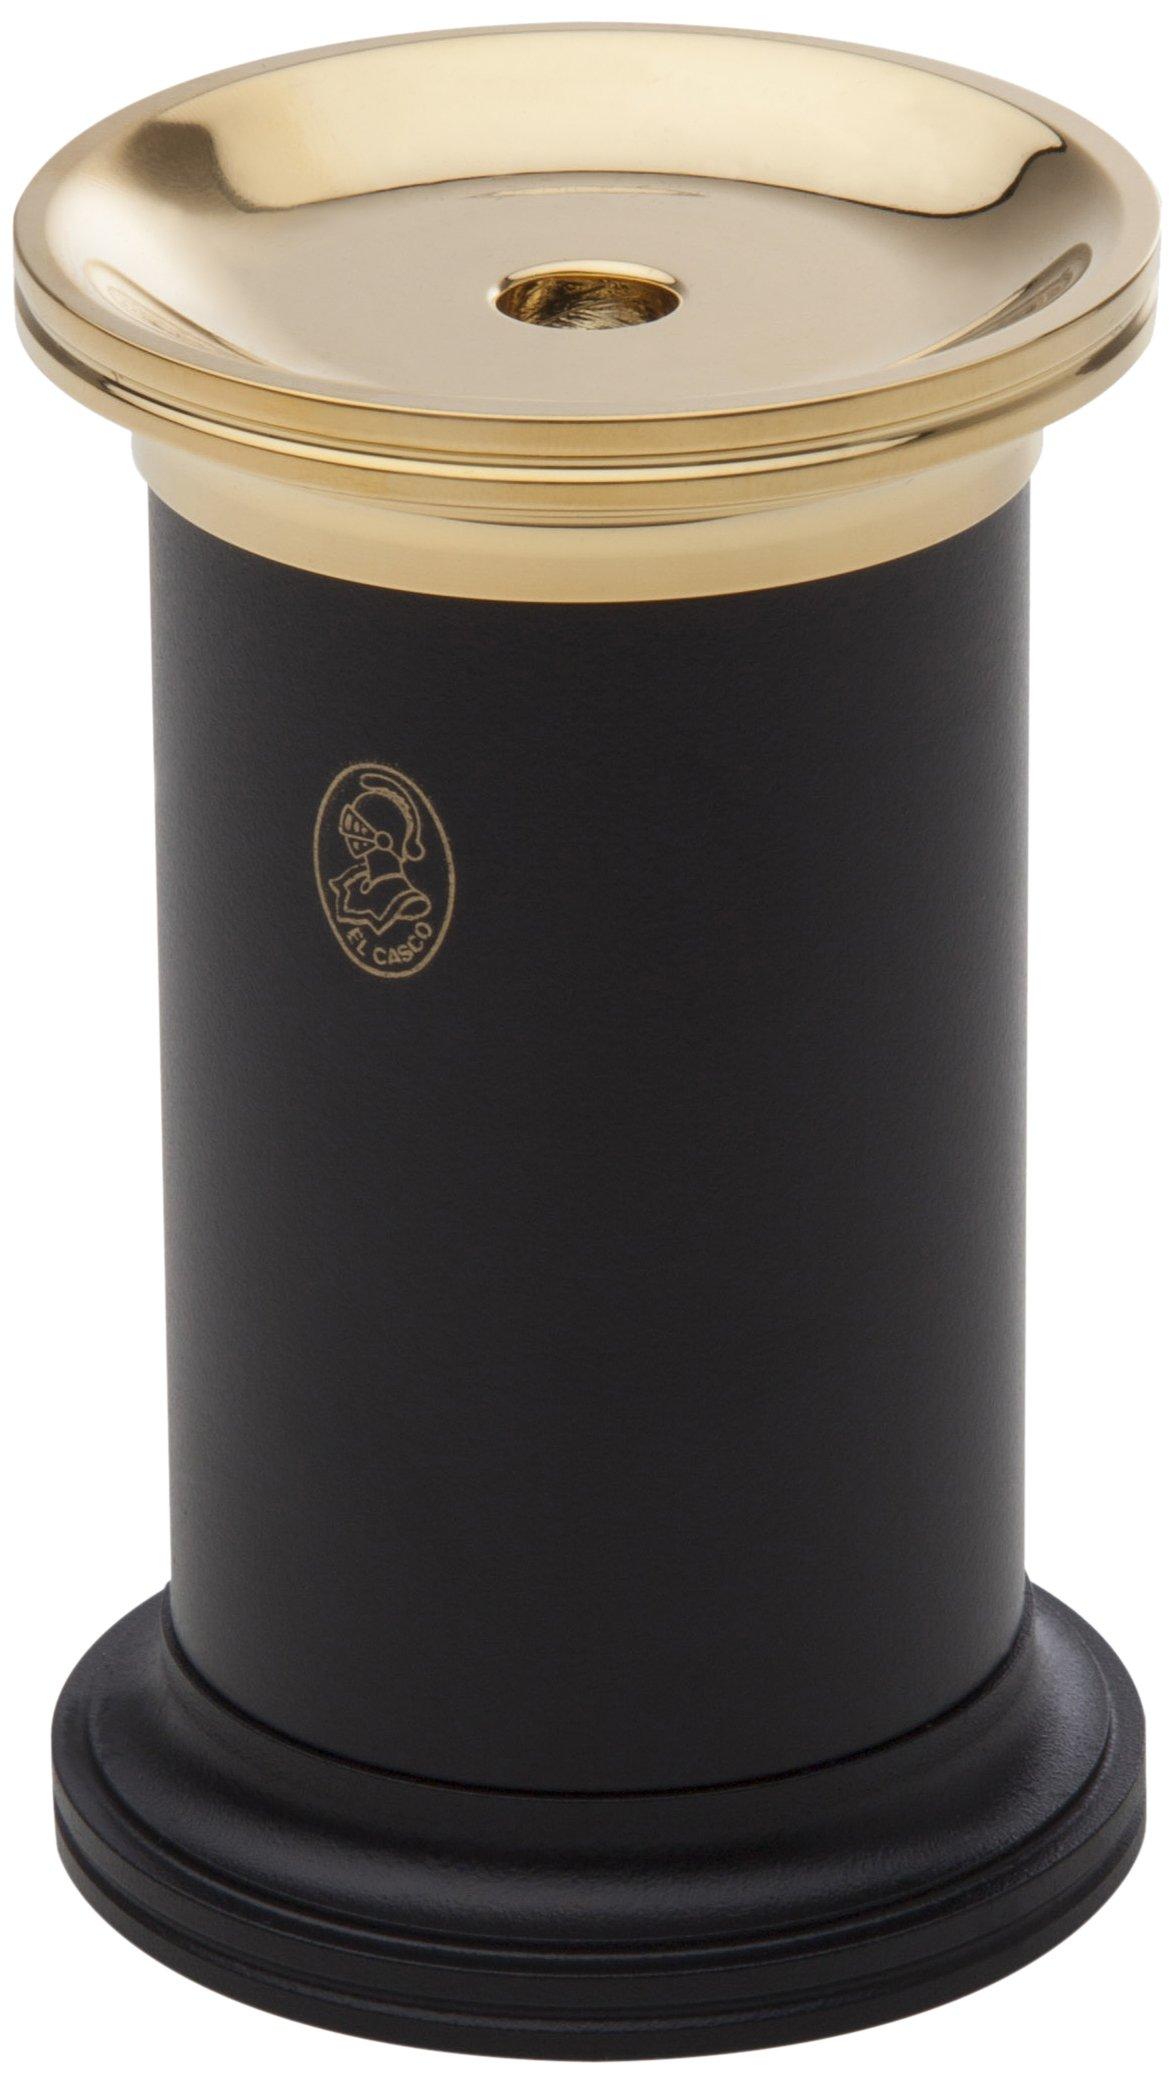 El Casco M435 Pencil Sharpener (Gold & black) by El Casco (Image #1)